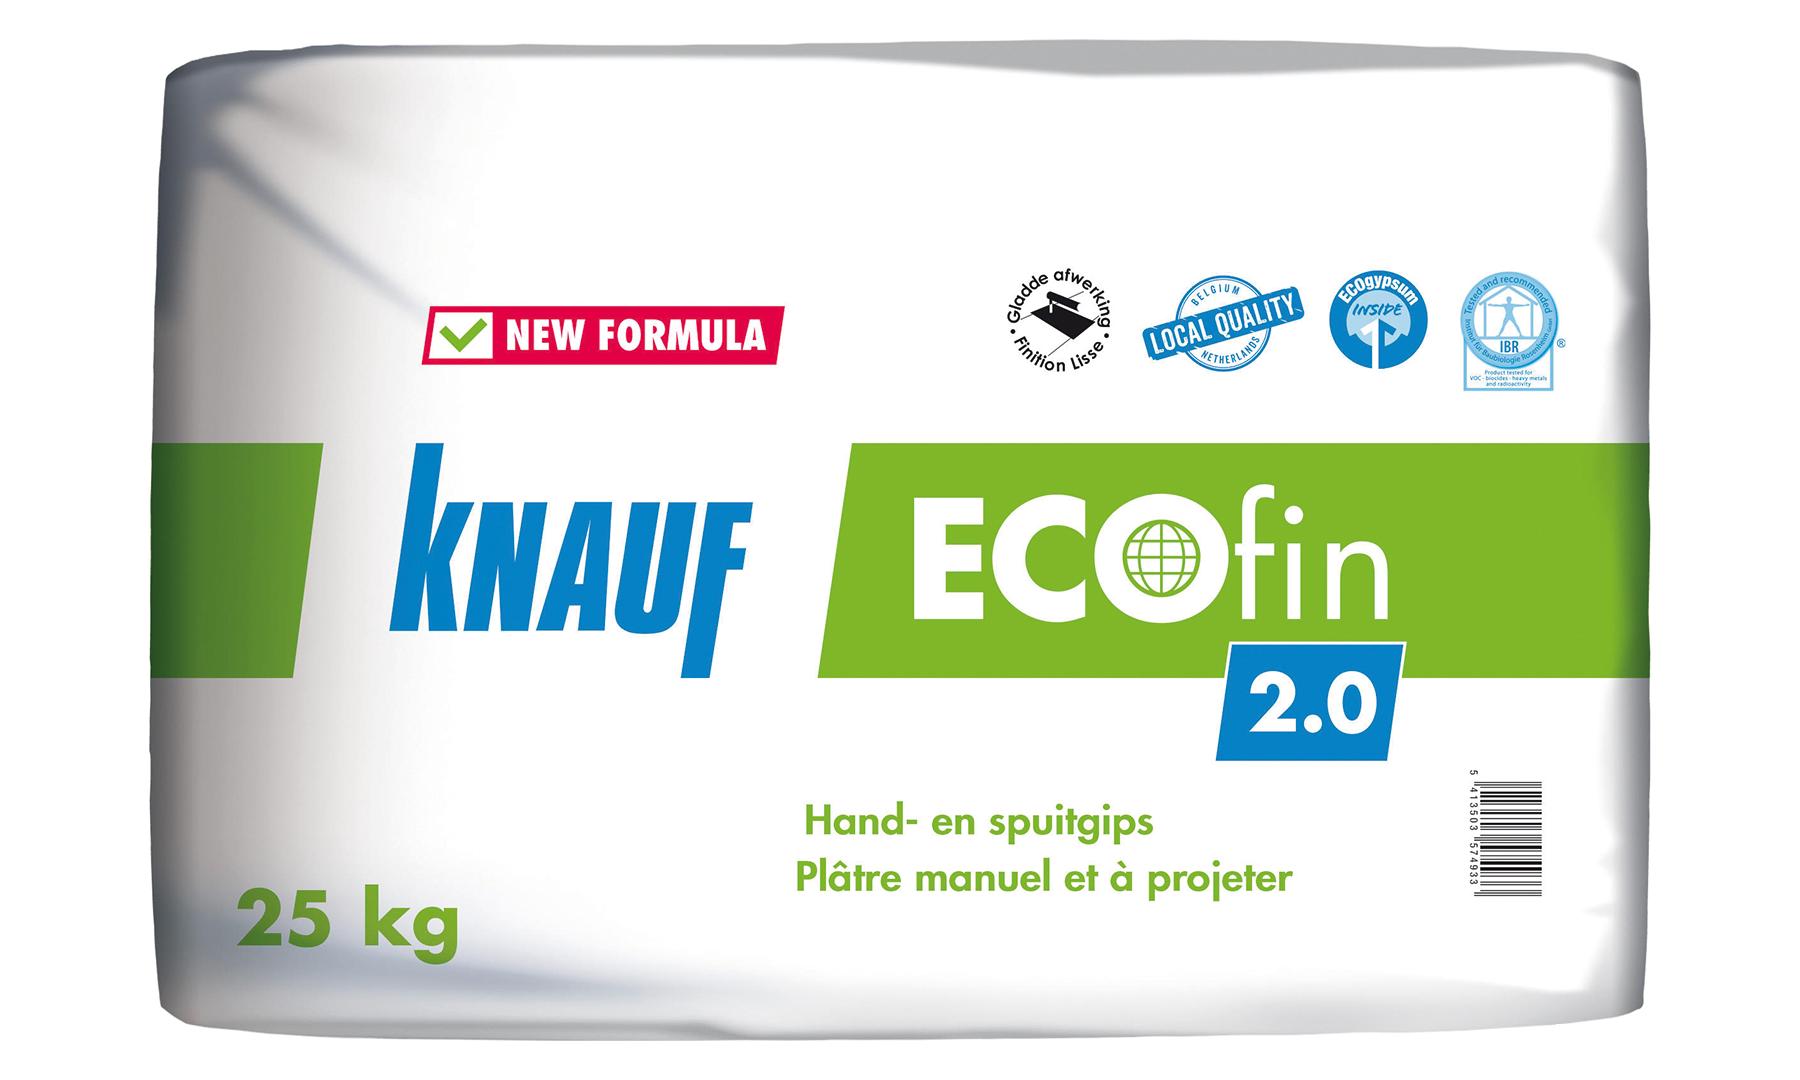 Ecofin 2.0